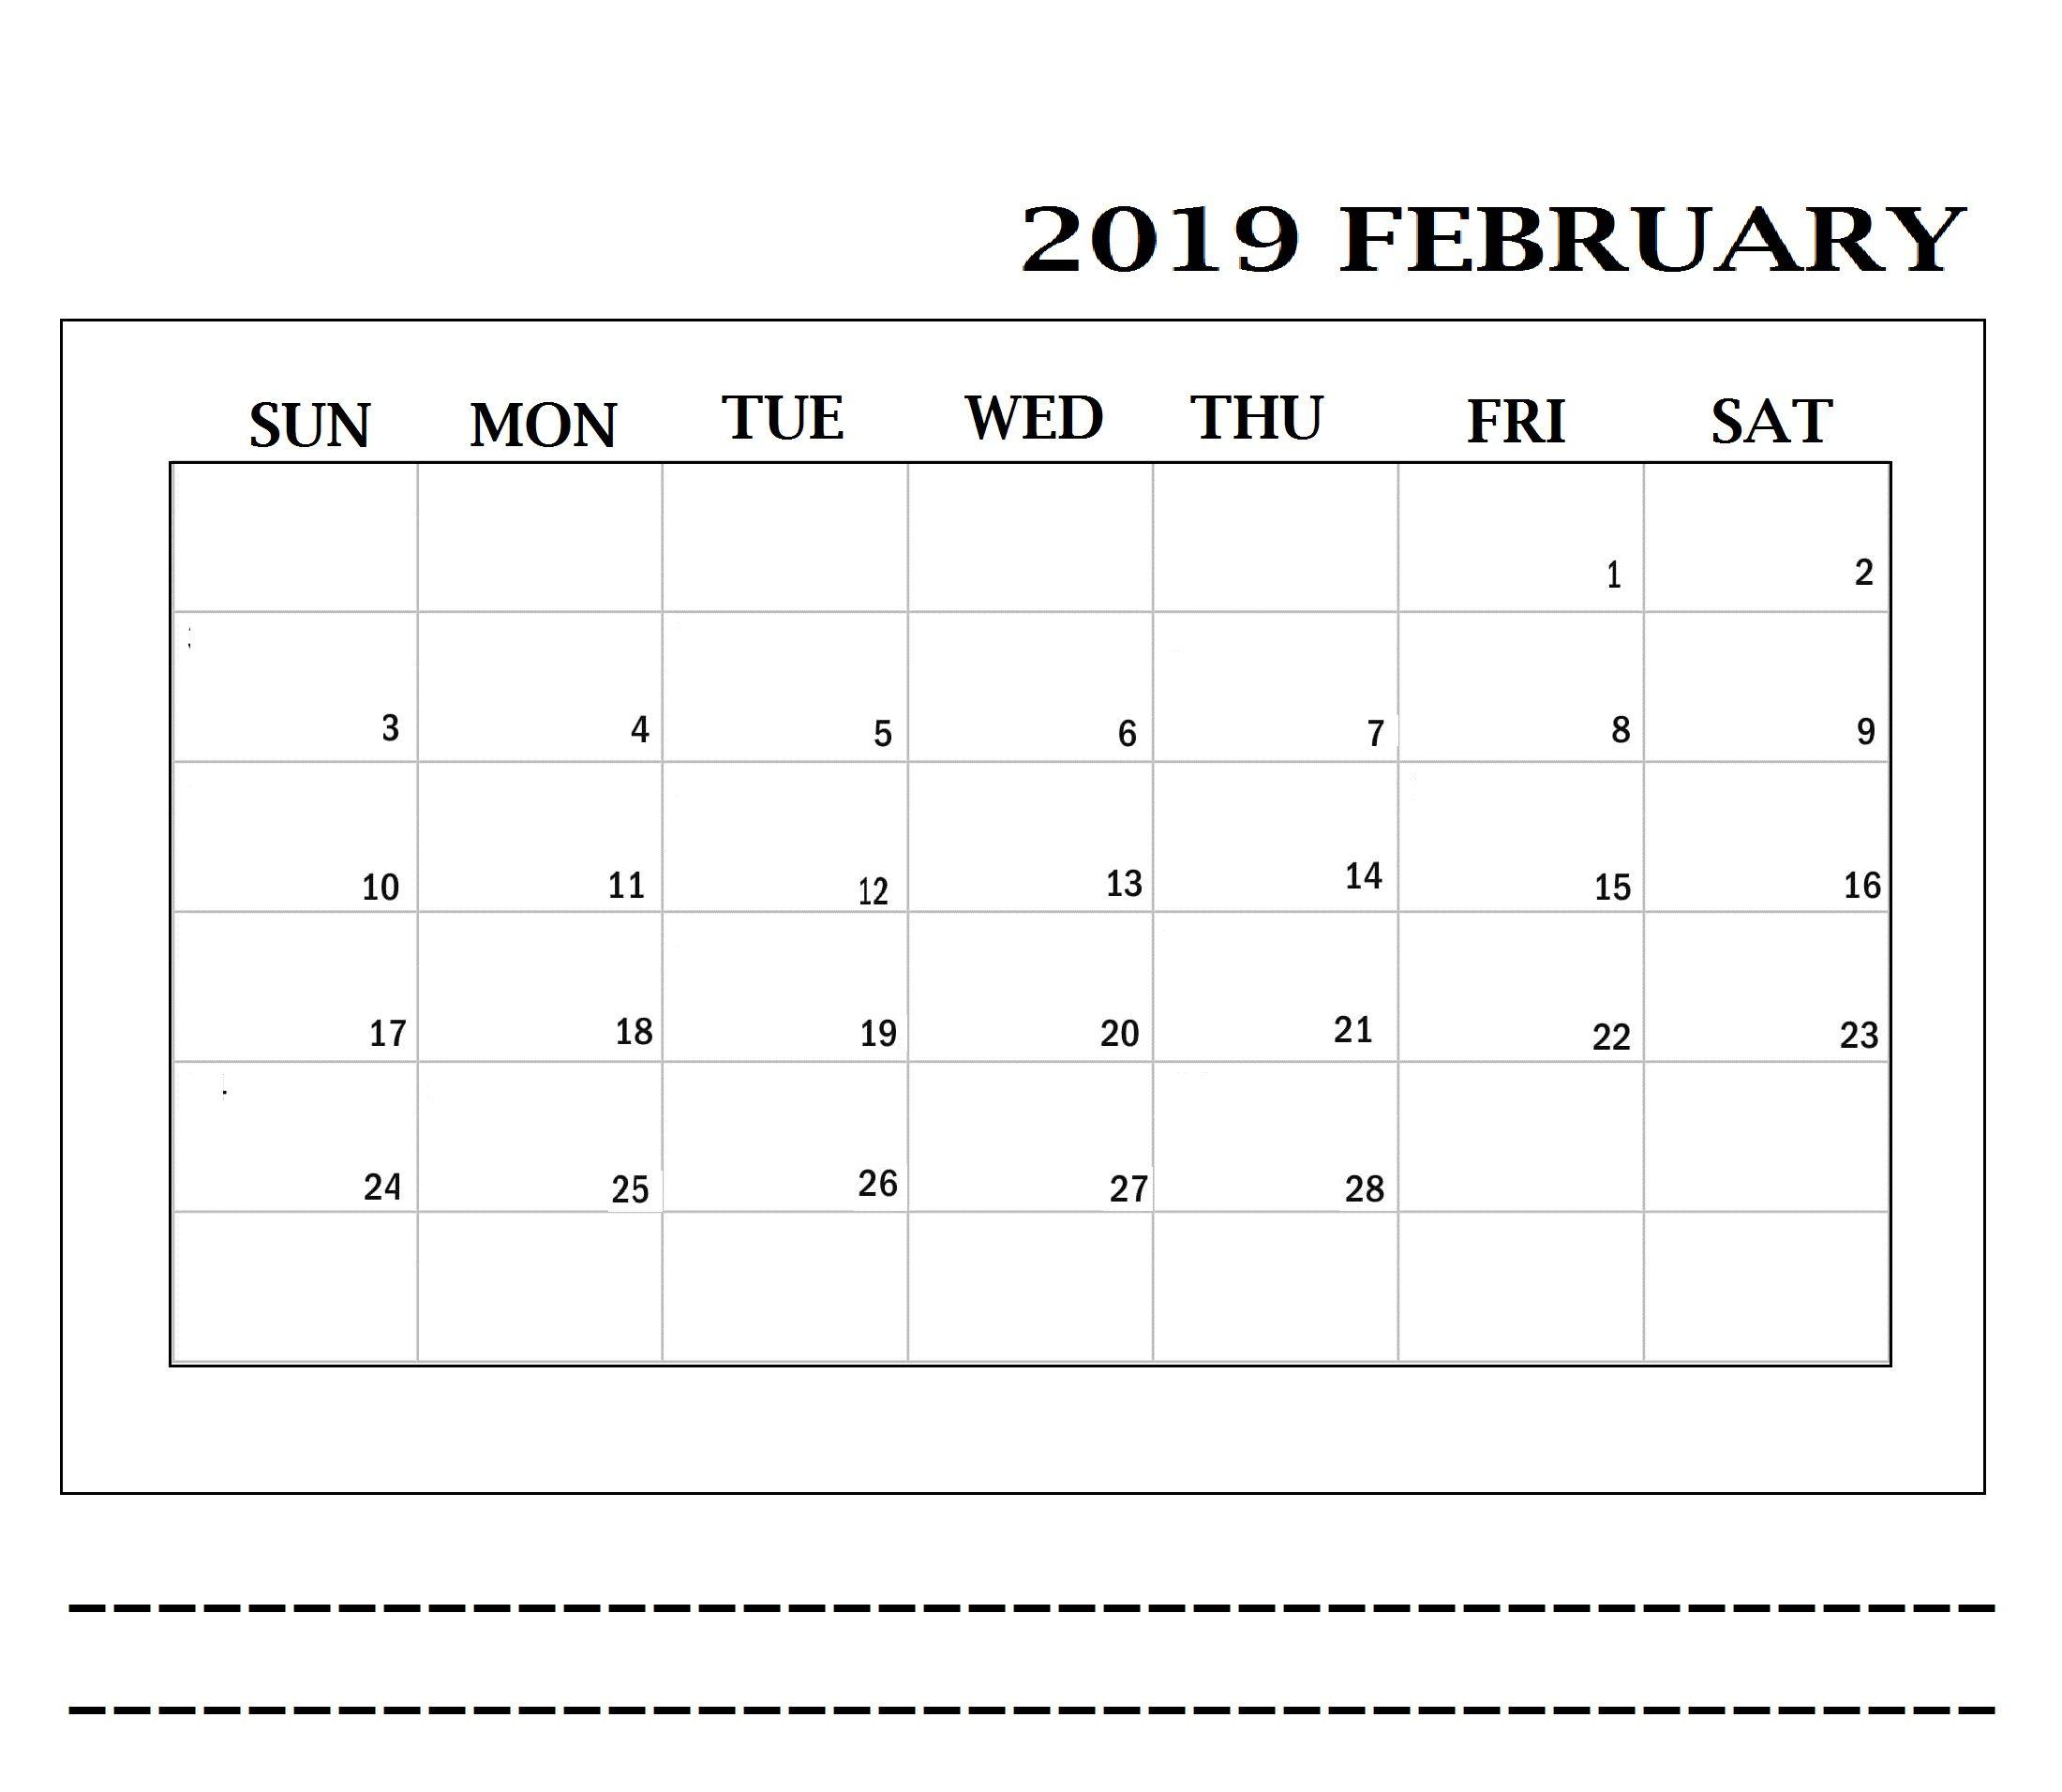 February 2019 Printable Calendar Date Ranges | February 2019 for Printable Calendar Date Range